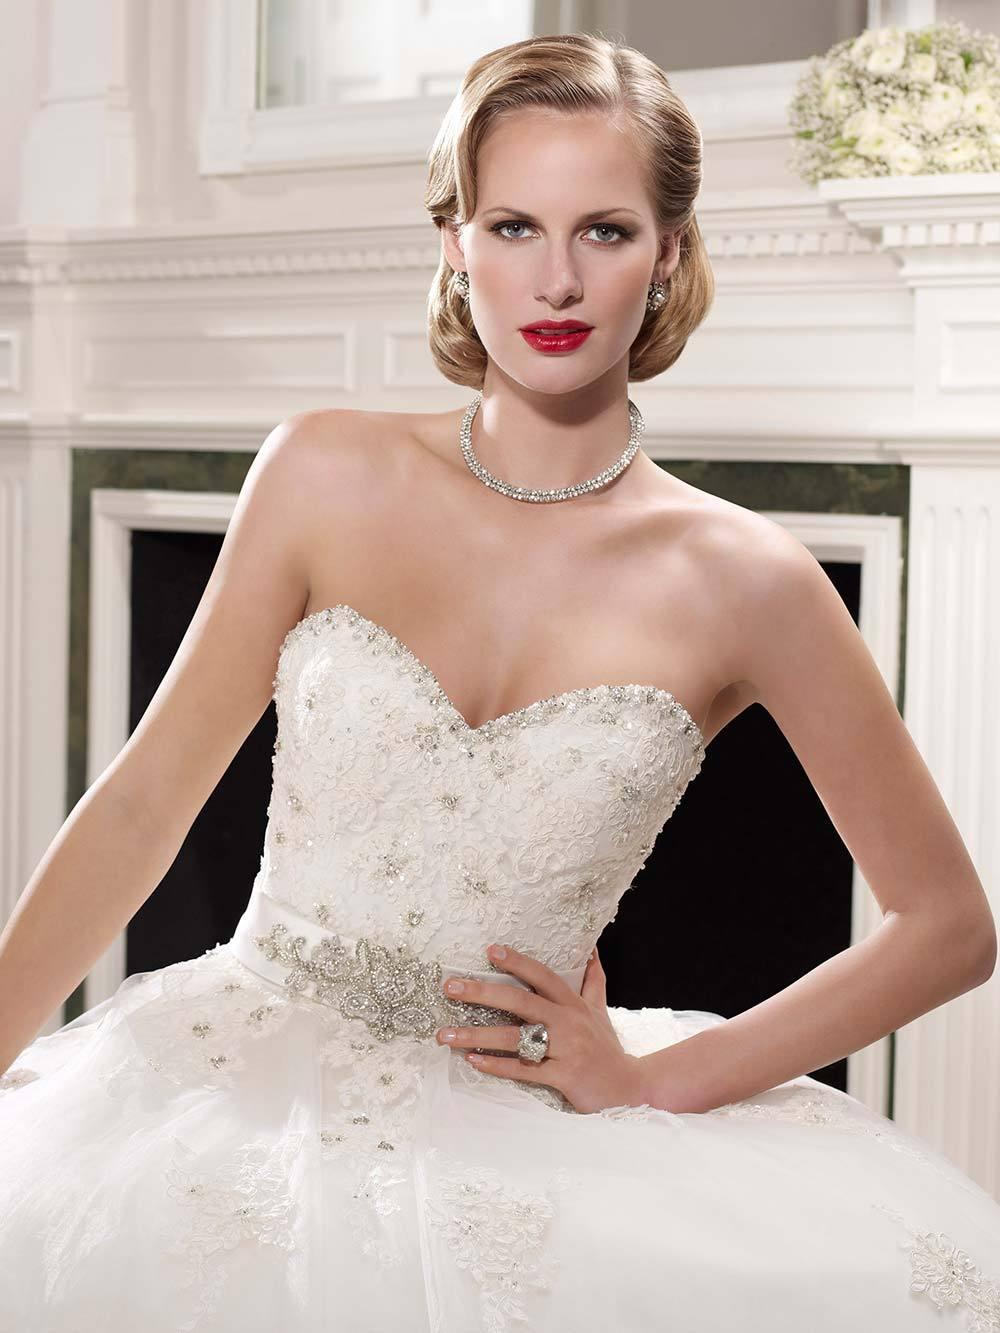 Brautkleid BOLOGNA 67071 von Ronald Joyce auf Ja.de